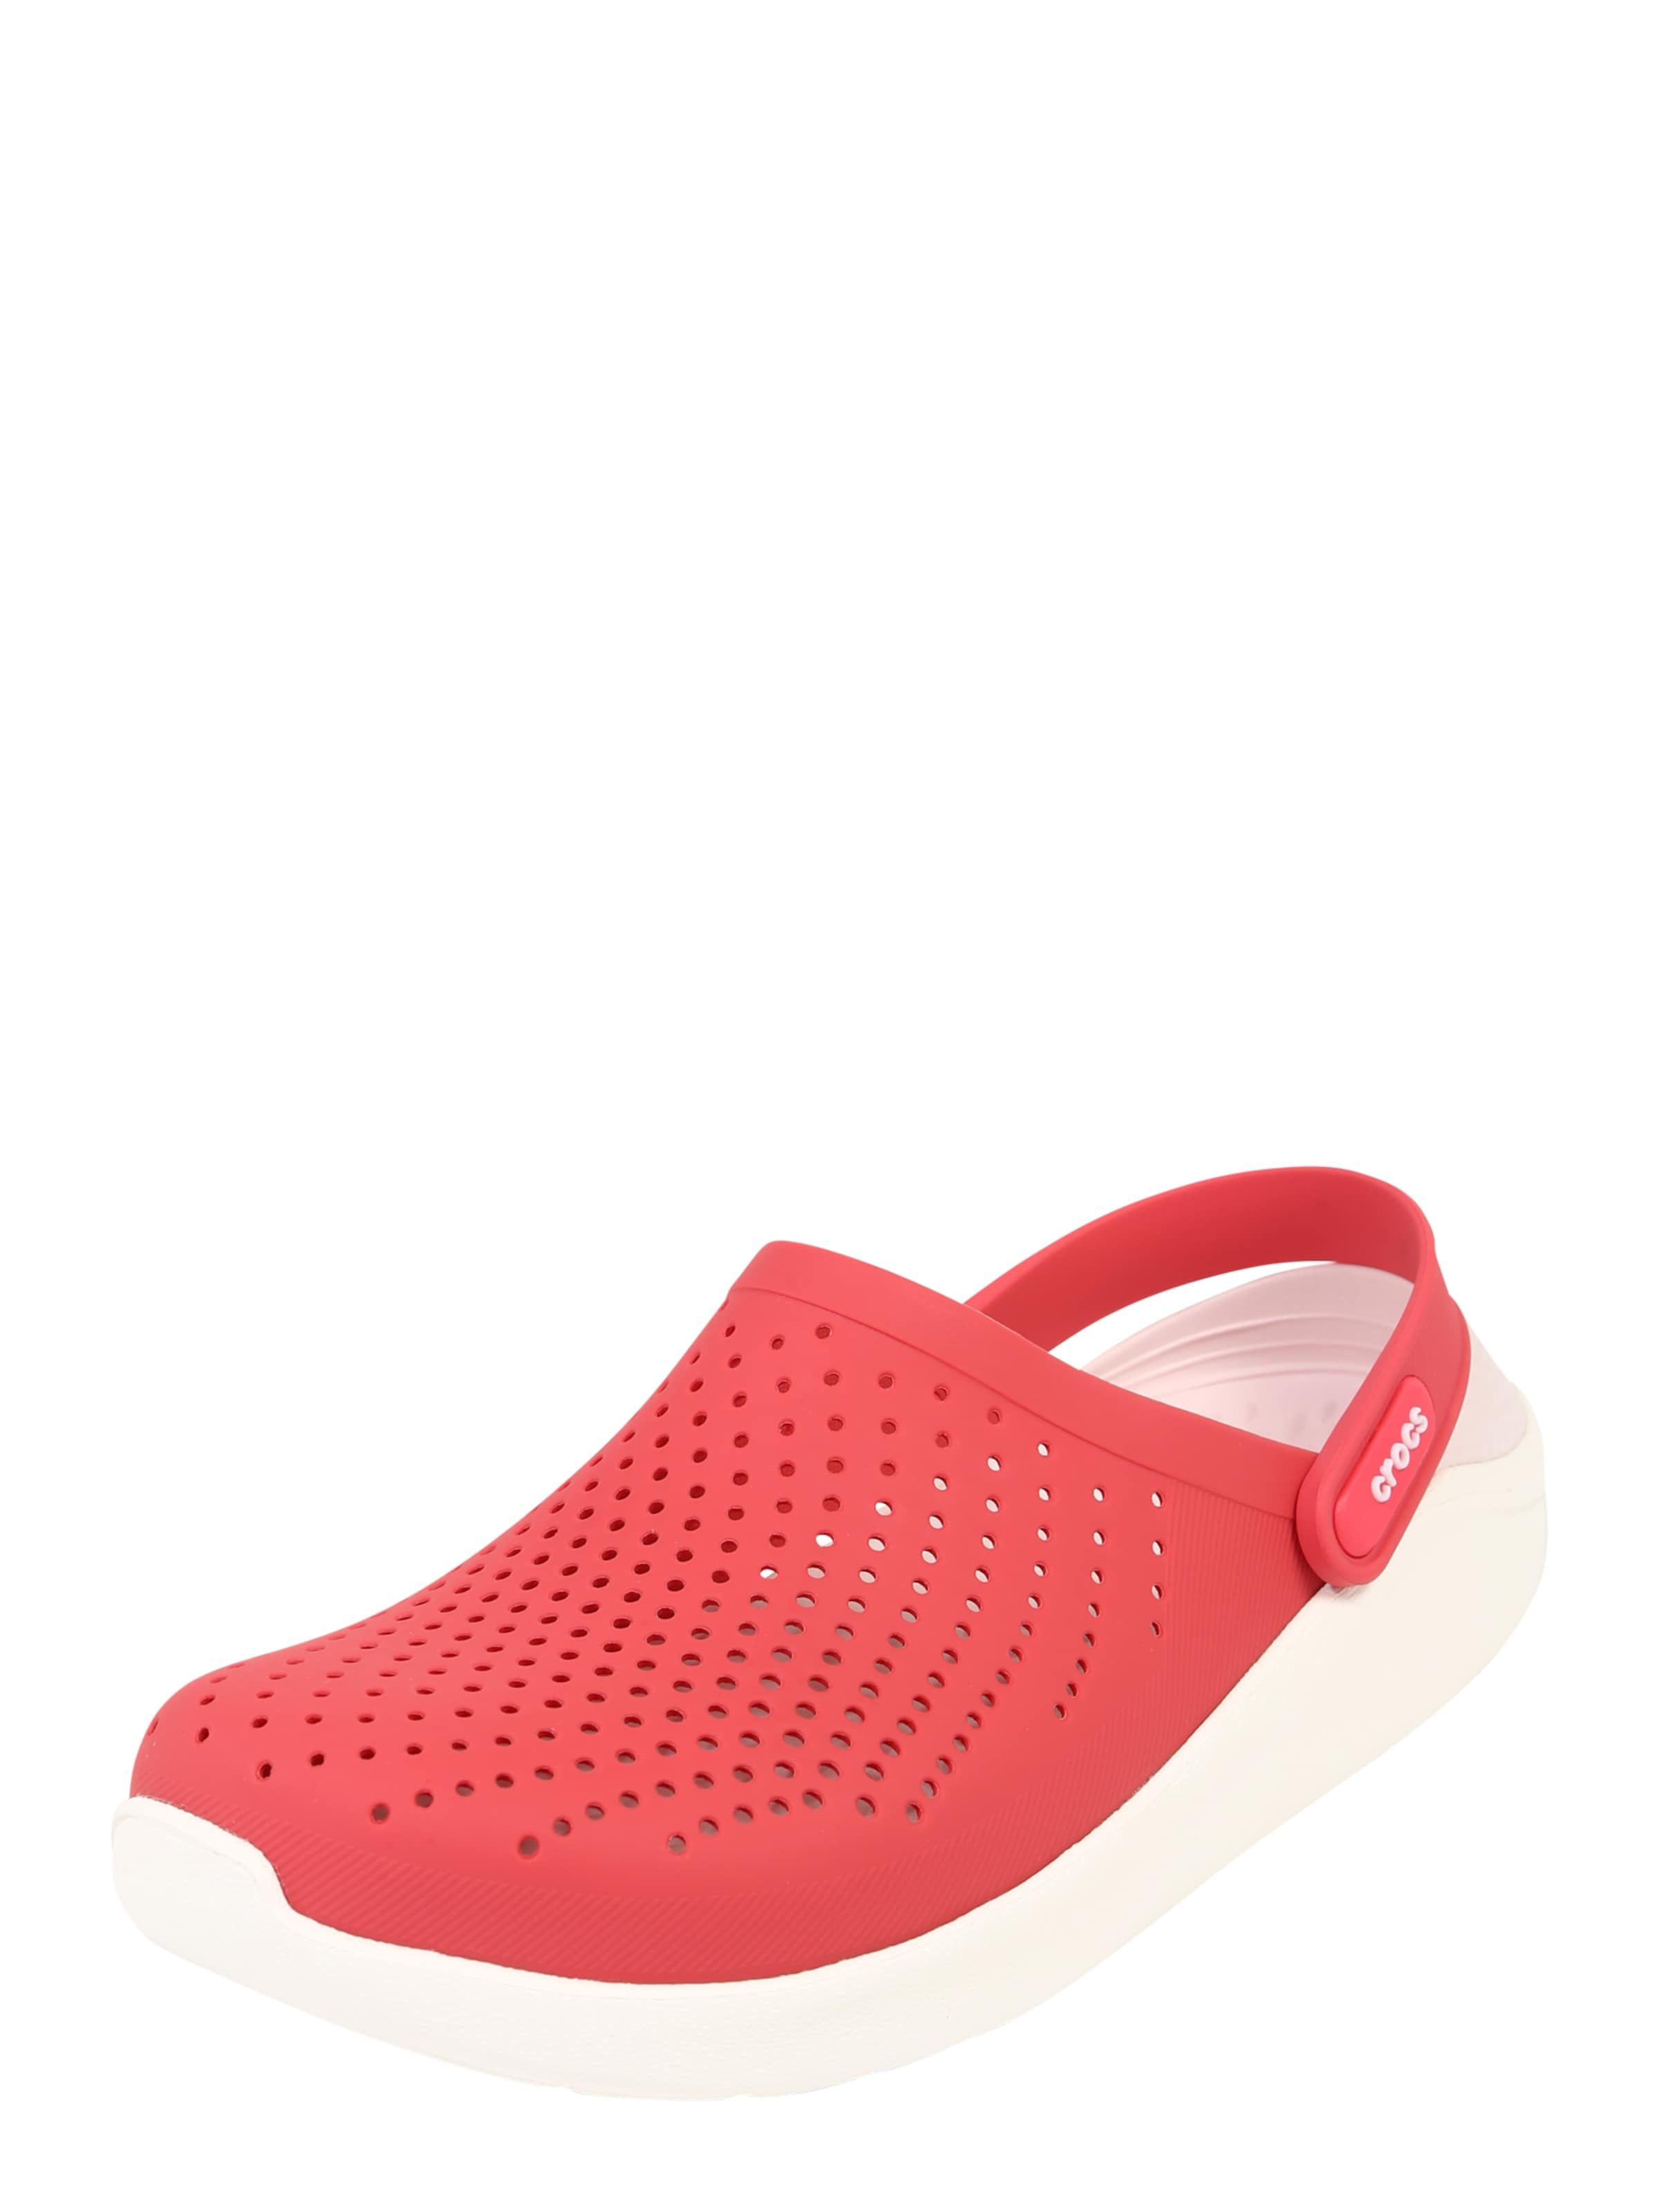 PinkWeiß Clogs Crocs 'rite Lite' In tQrsdhC